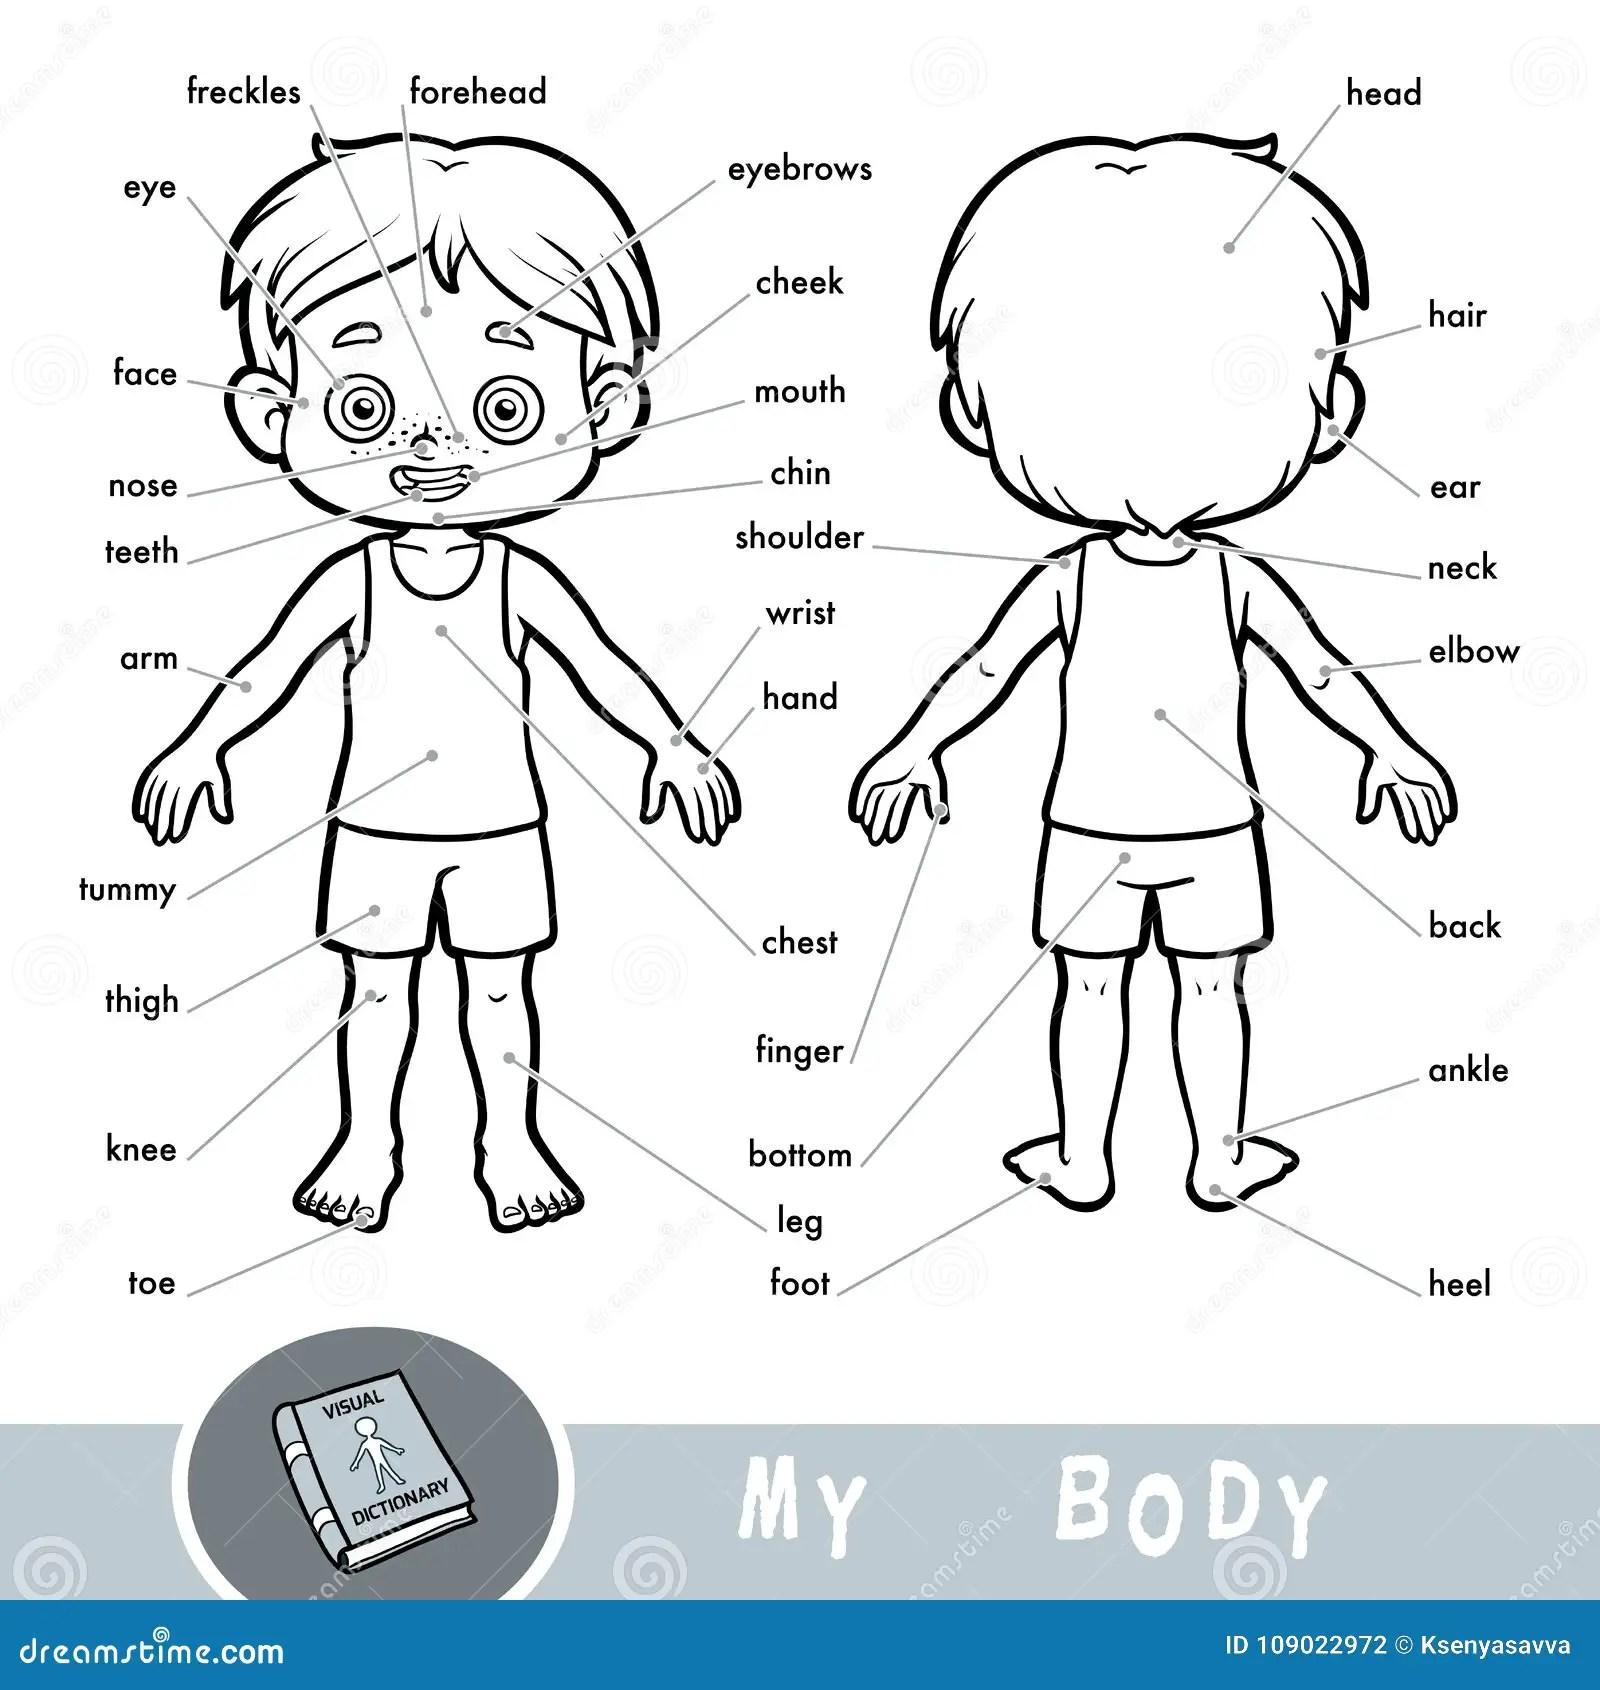 30 Label Of Human Body